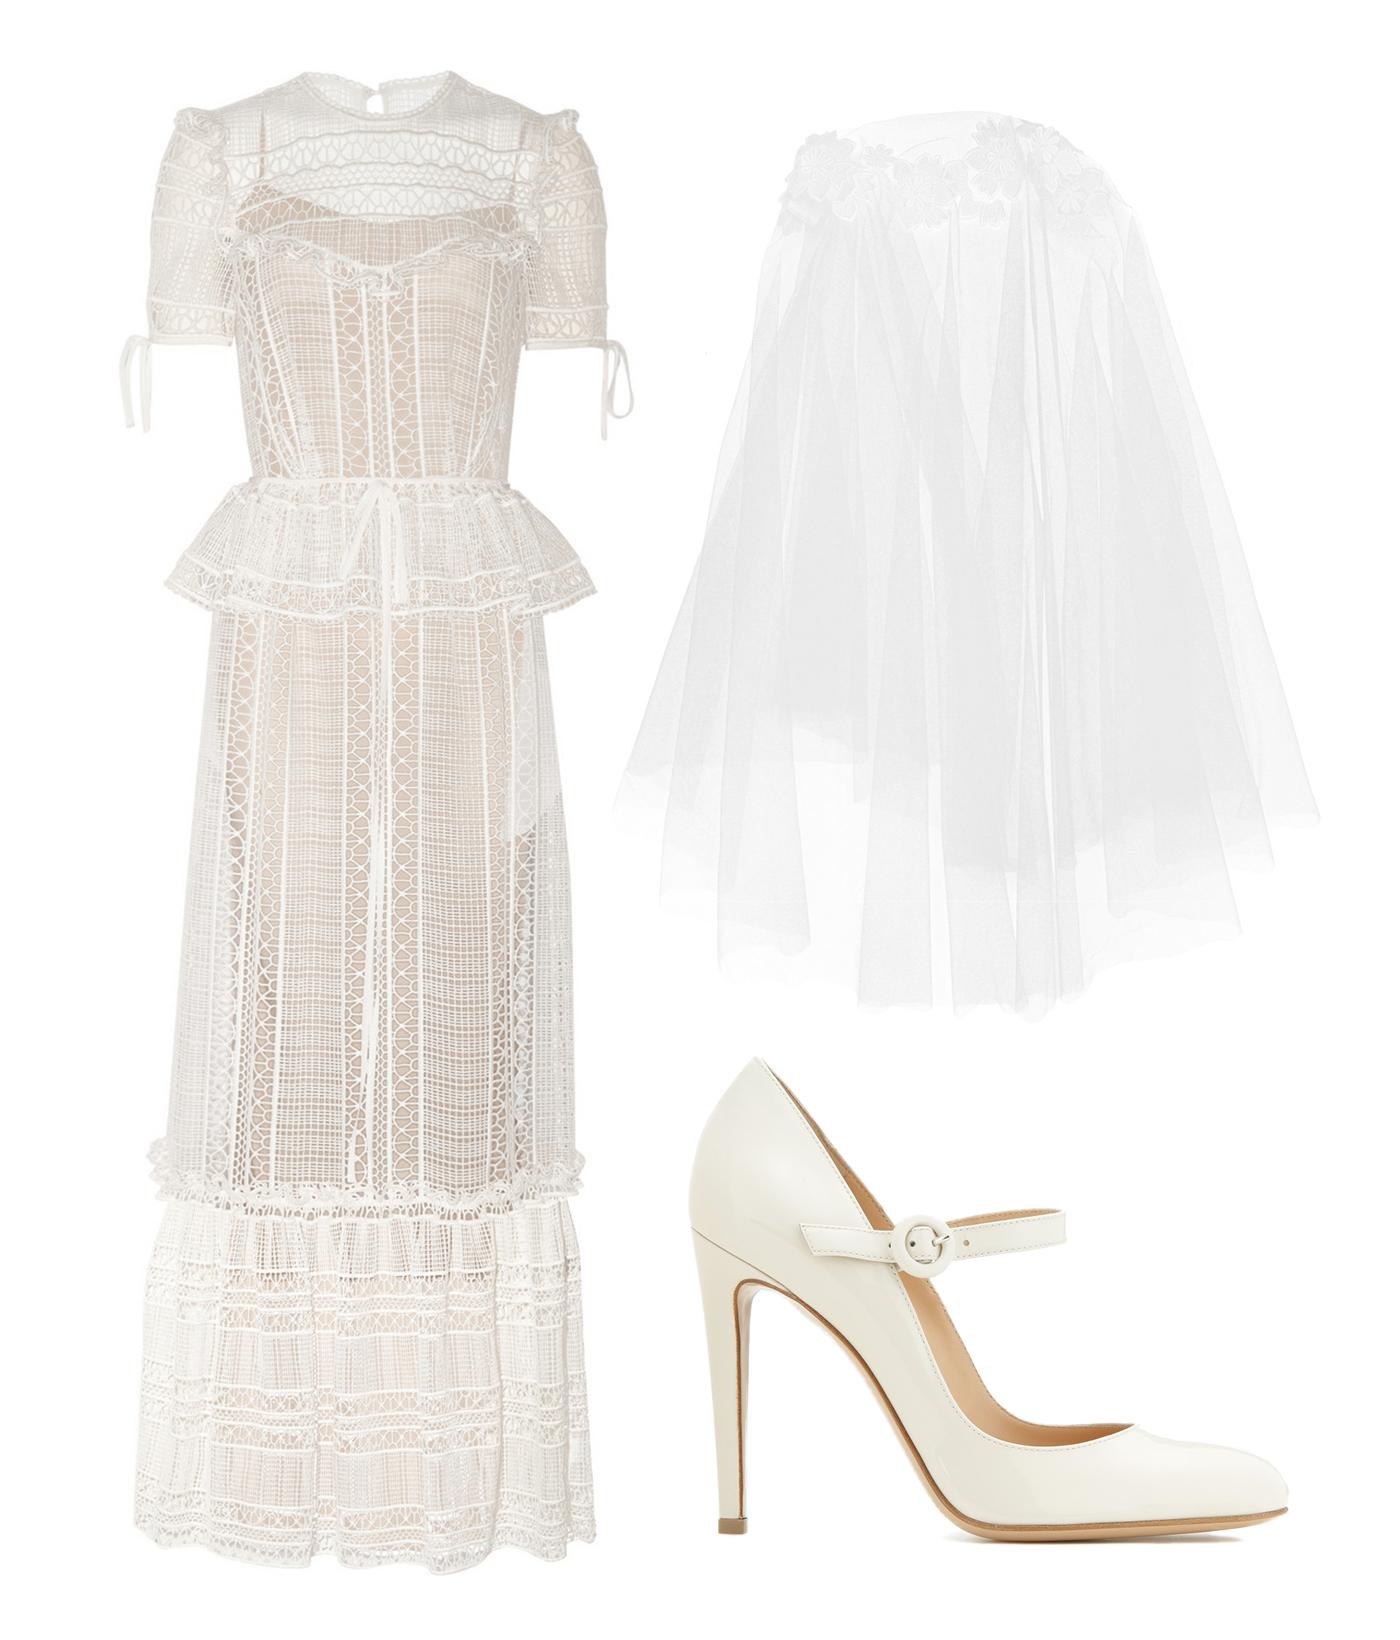 spring-wedding-dresses-accessories-14.jpg